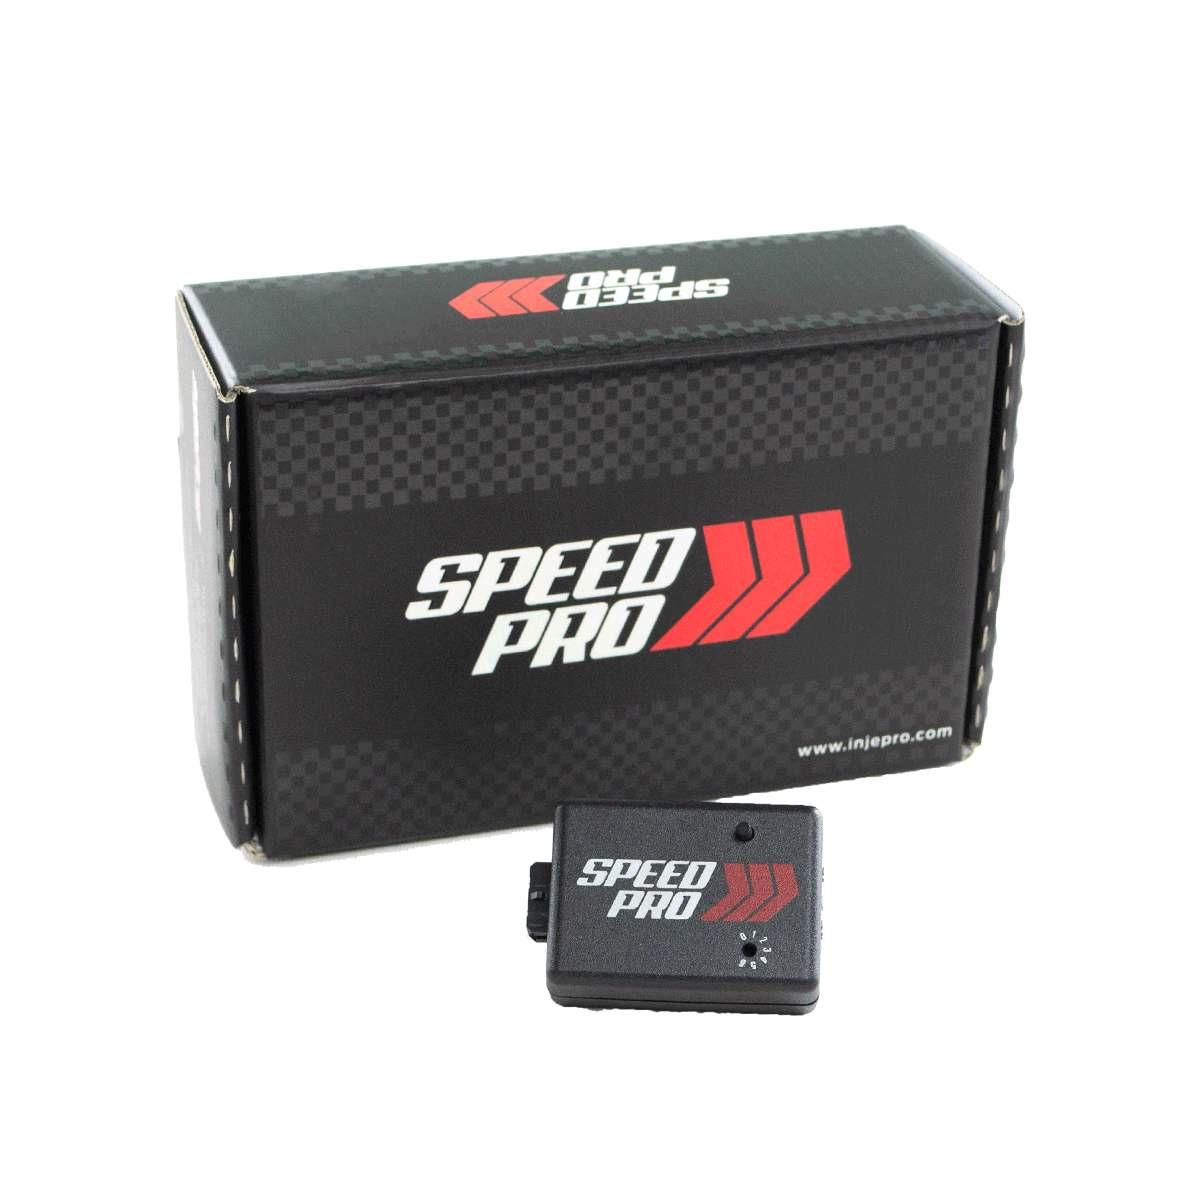 Chip De Potência Para Pedal Speedpro Para Nissan Frontier